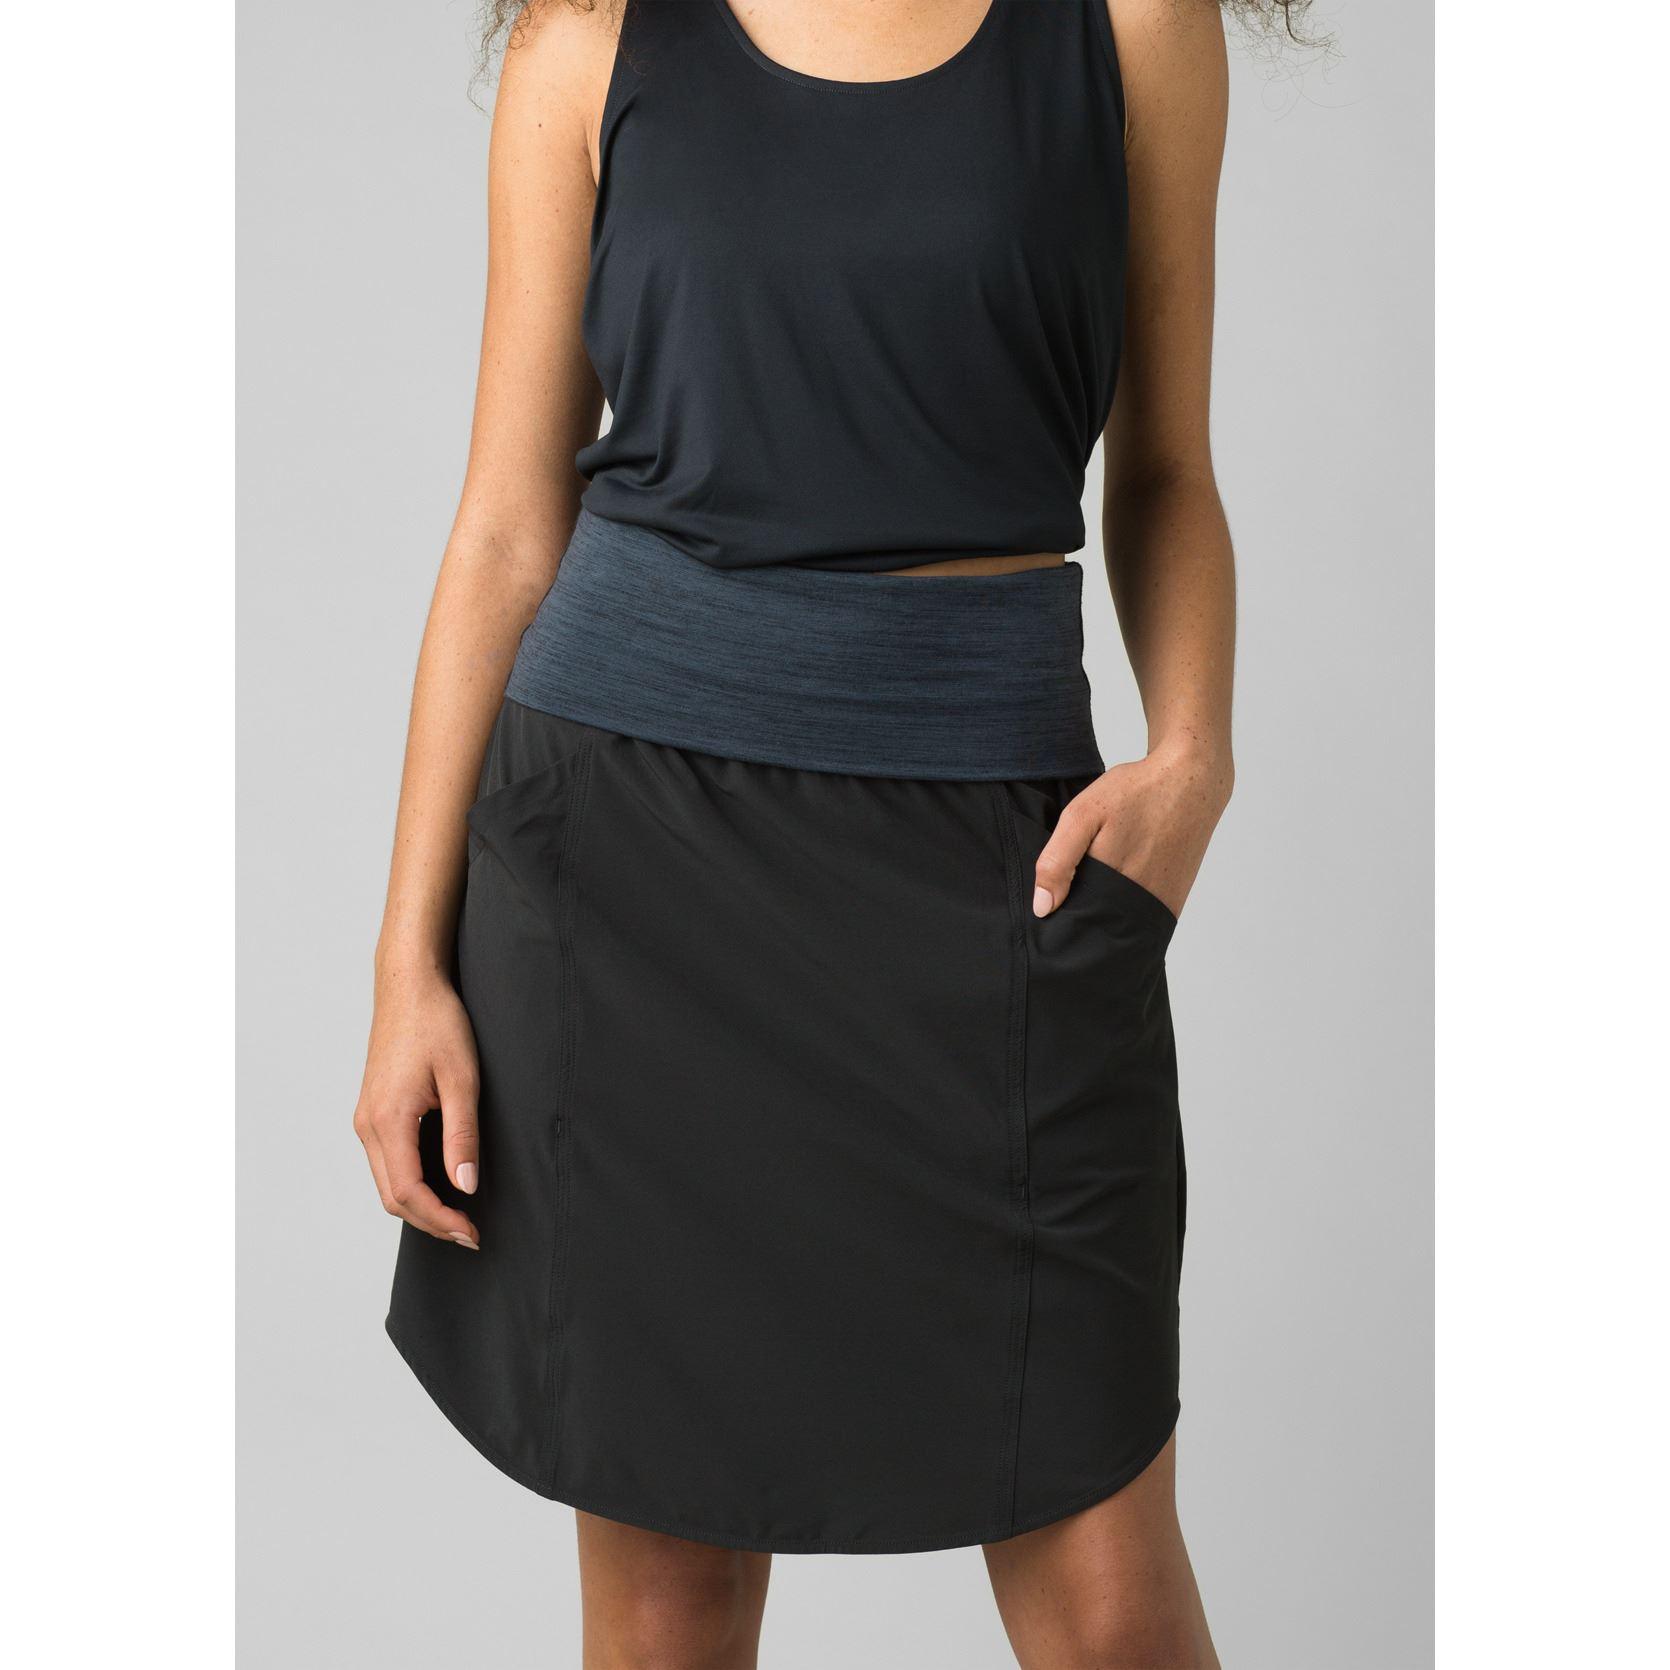 Buffy Skirt - Women's